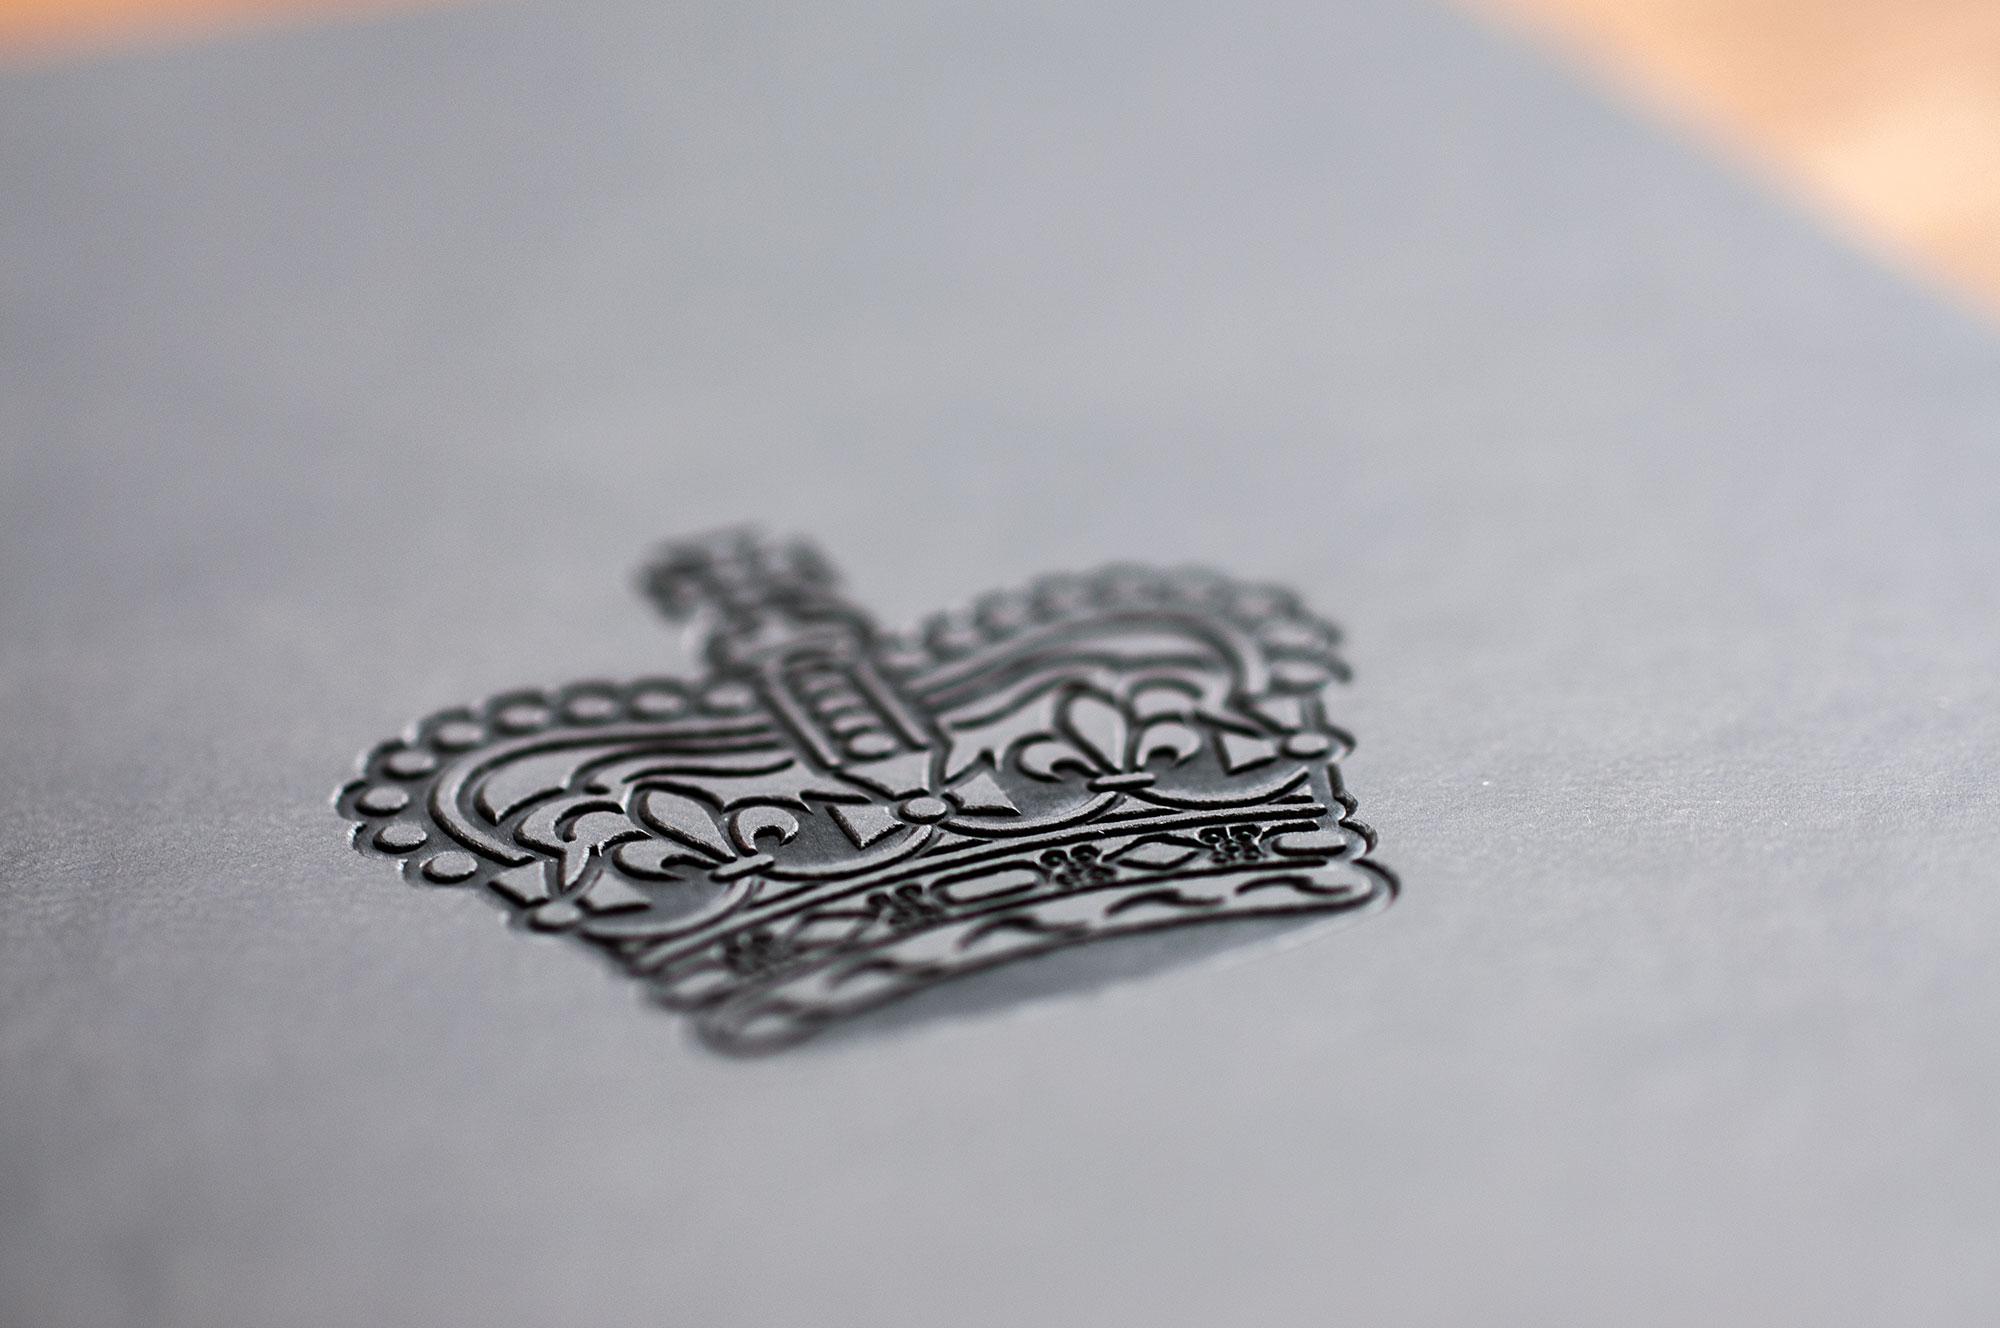 Embossed notebooks - amazing detail